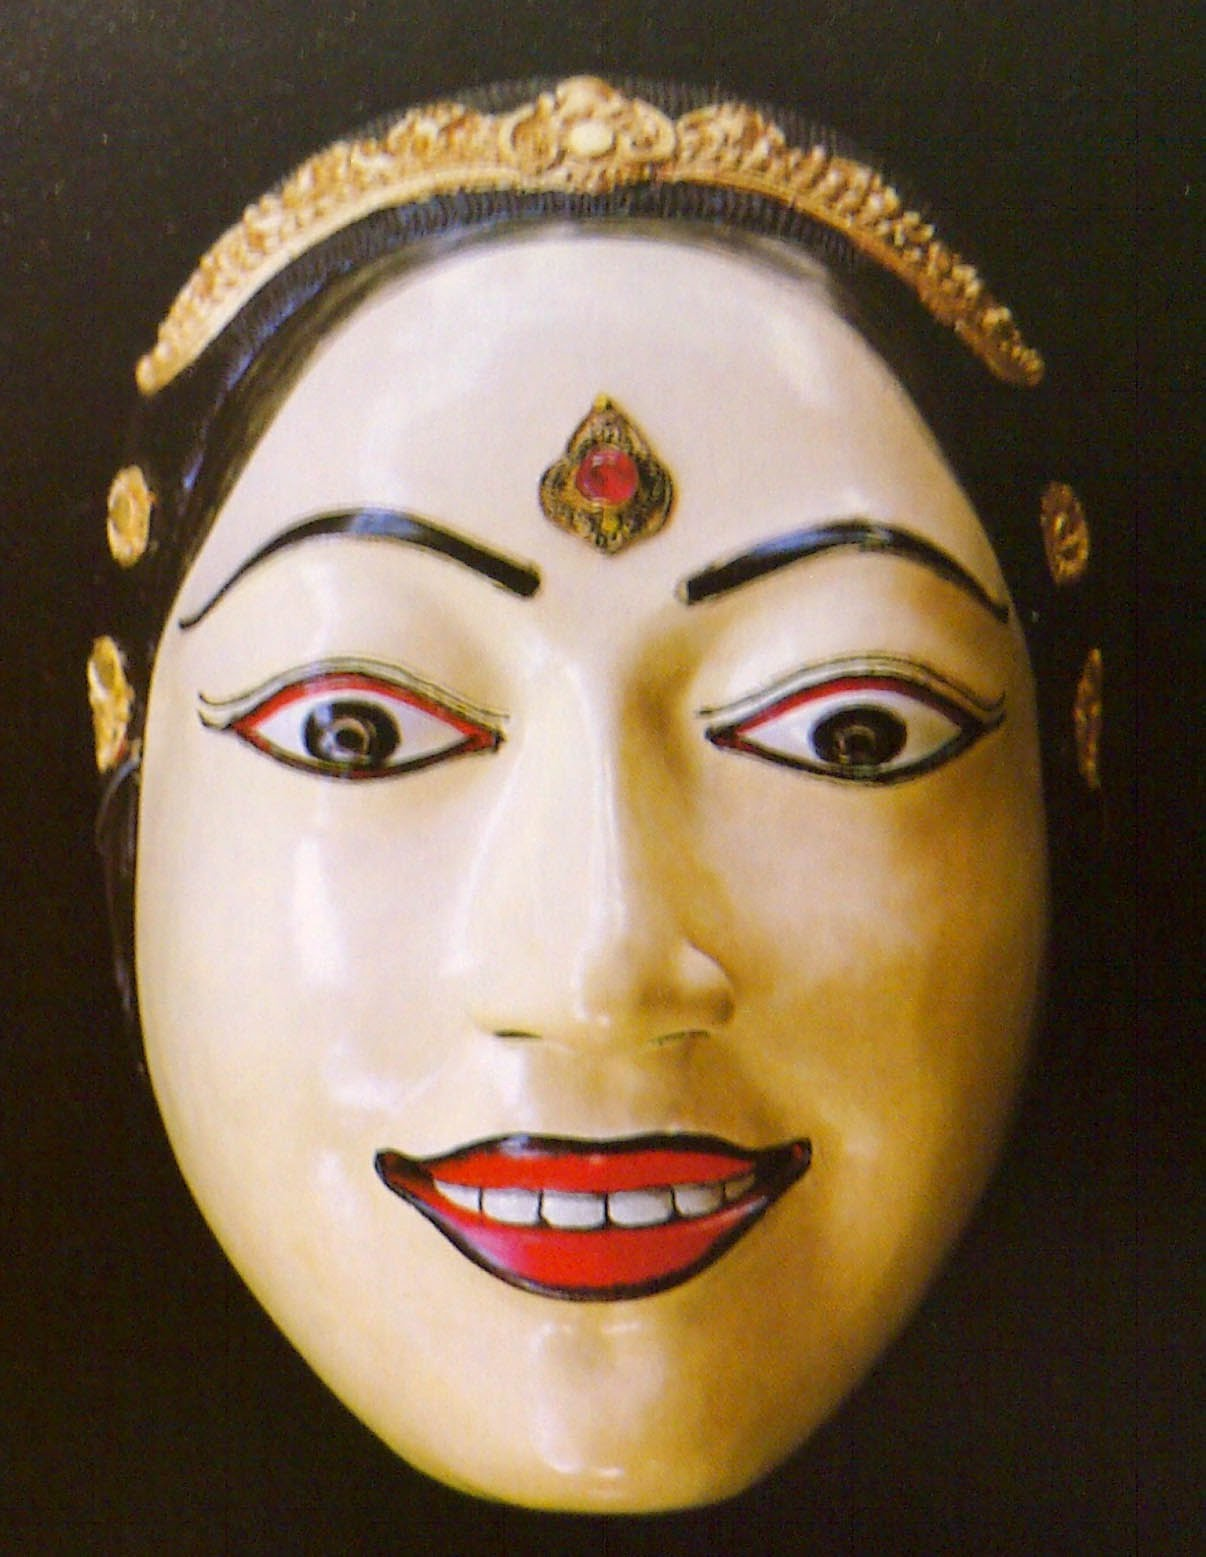 KUMPULAN GAMBAR TOPENG TRADISIONAL Gambar Topeng Seni Budaya